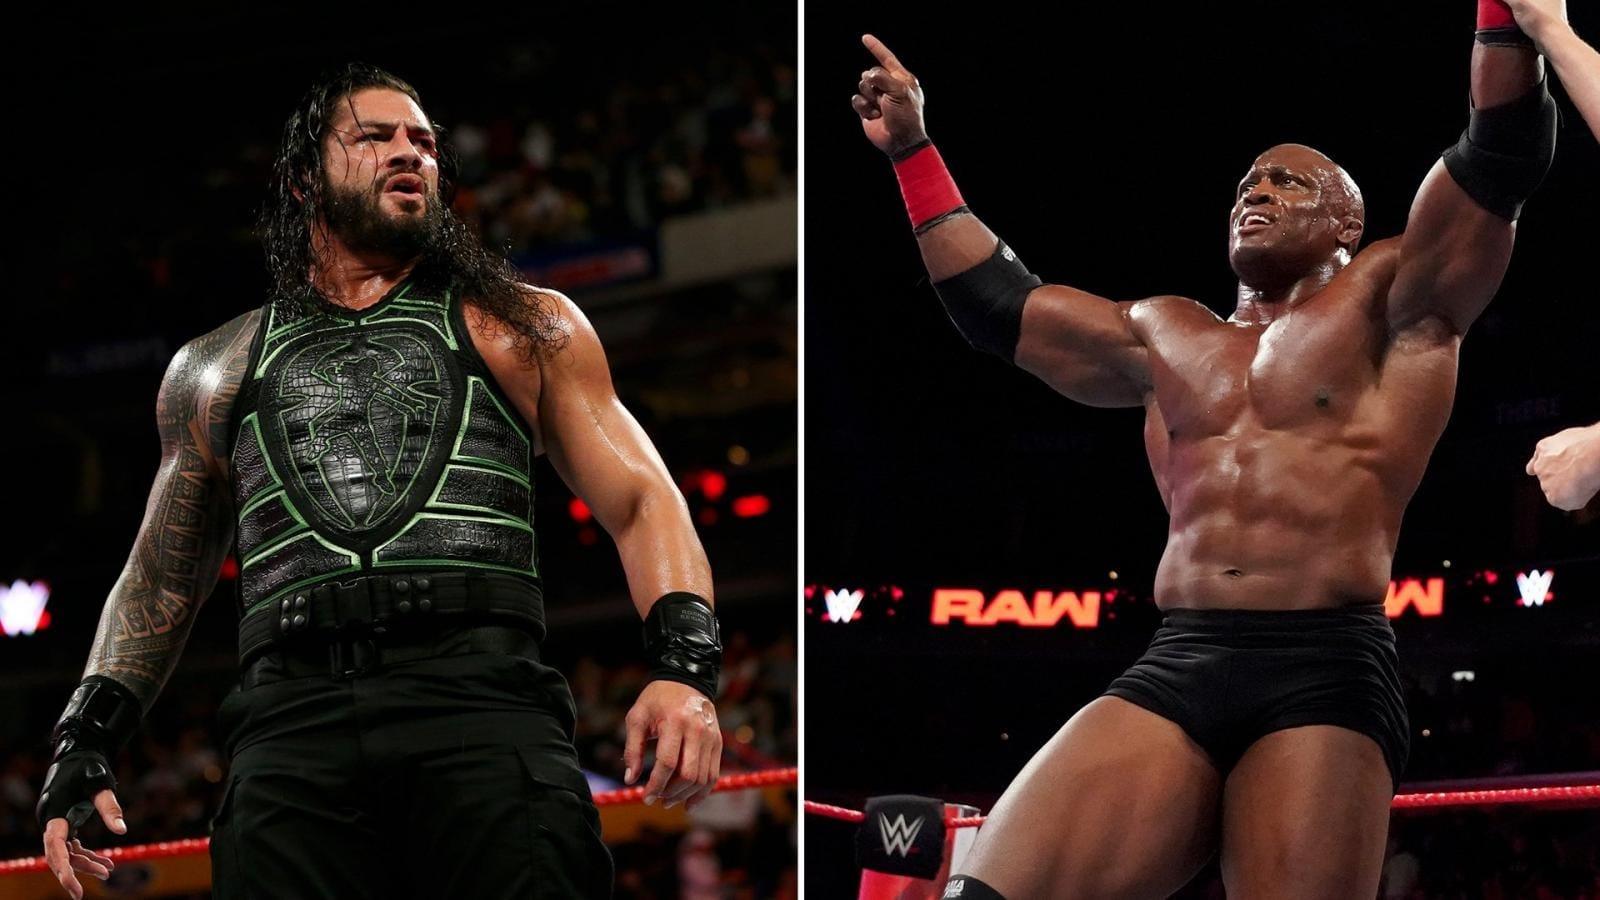 WWE Raw Season 26 :Episode 29  July 16, 2018 (Buffalo, NY)